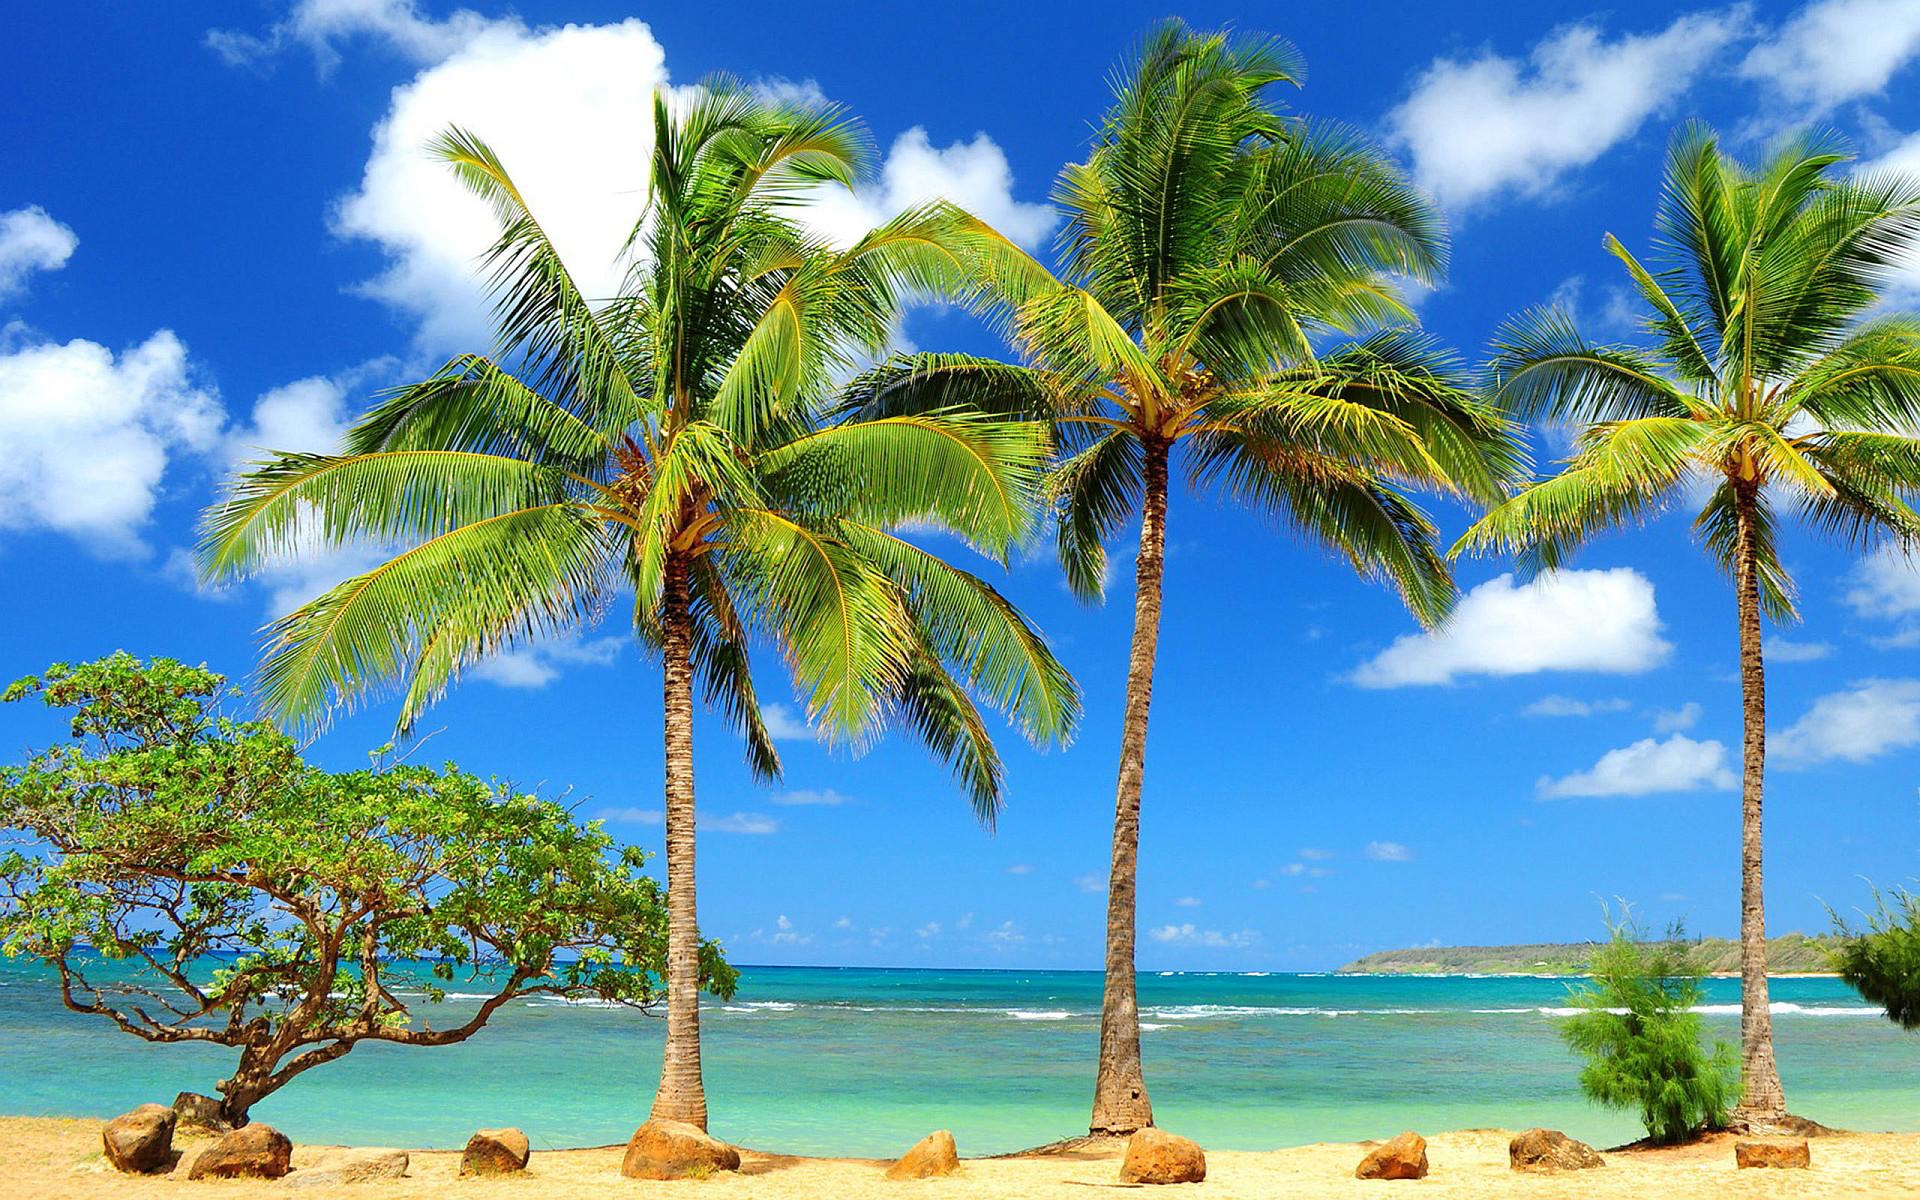 Sunny Beach Wallpaper Wide